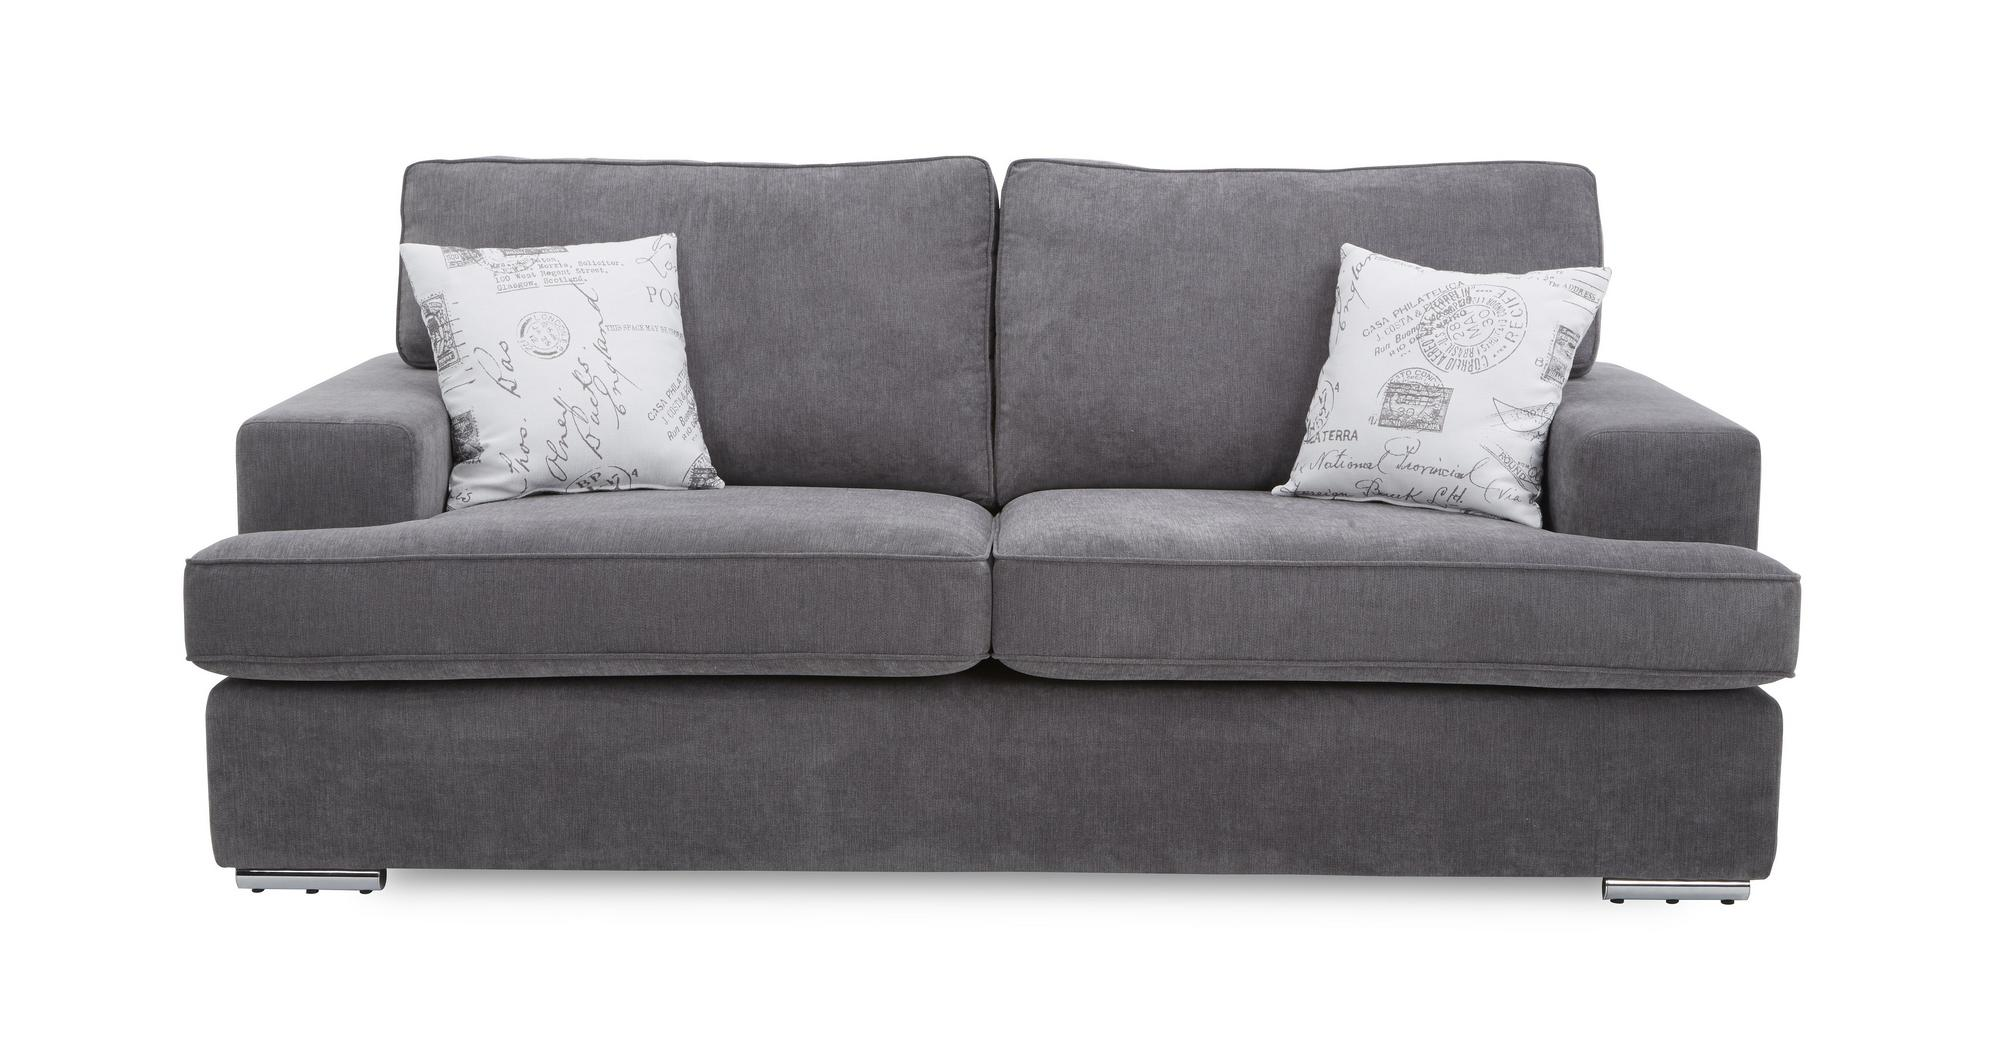 Dfs merit graphite grey fabric 3 seater sofa ebay for Custom made sofas uk